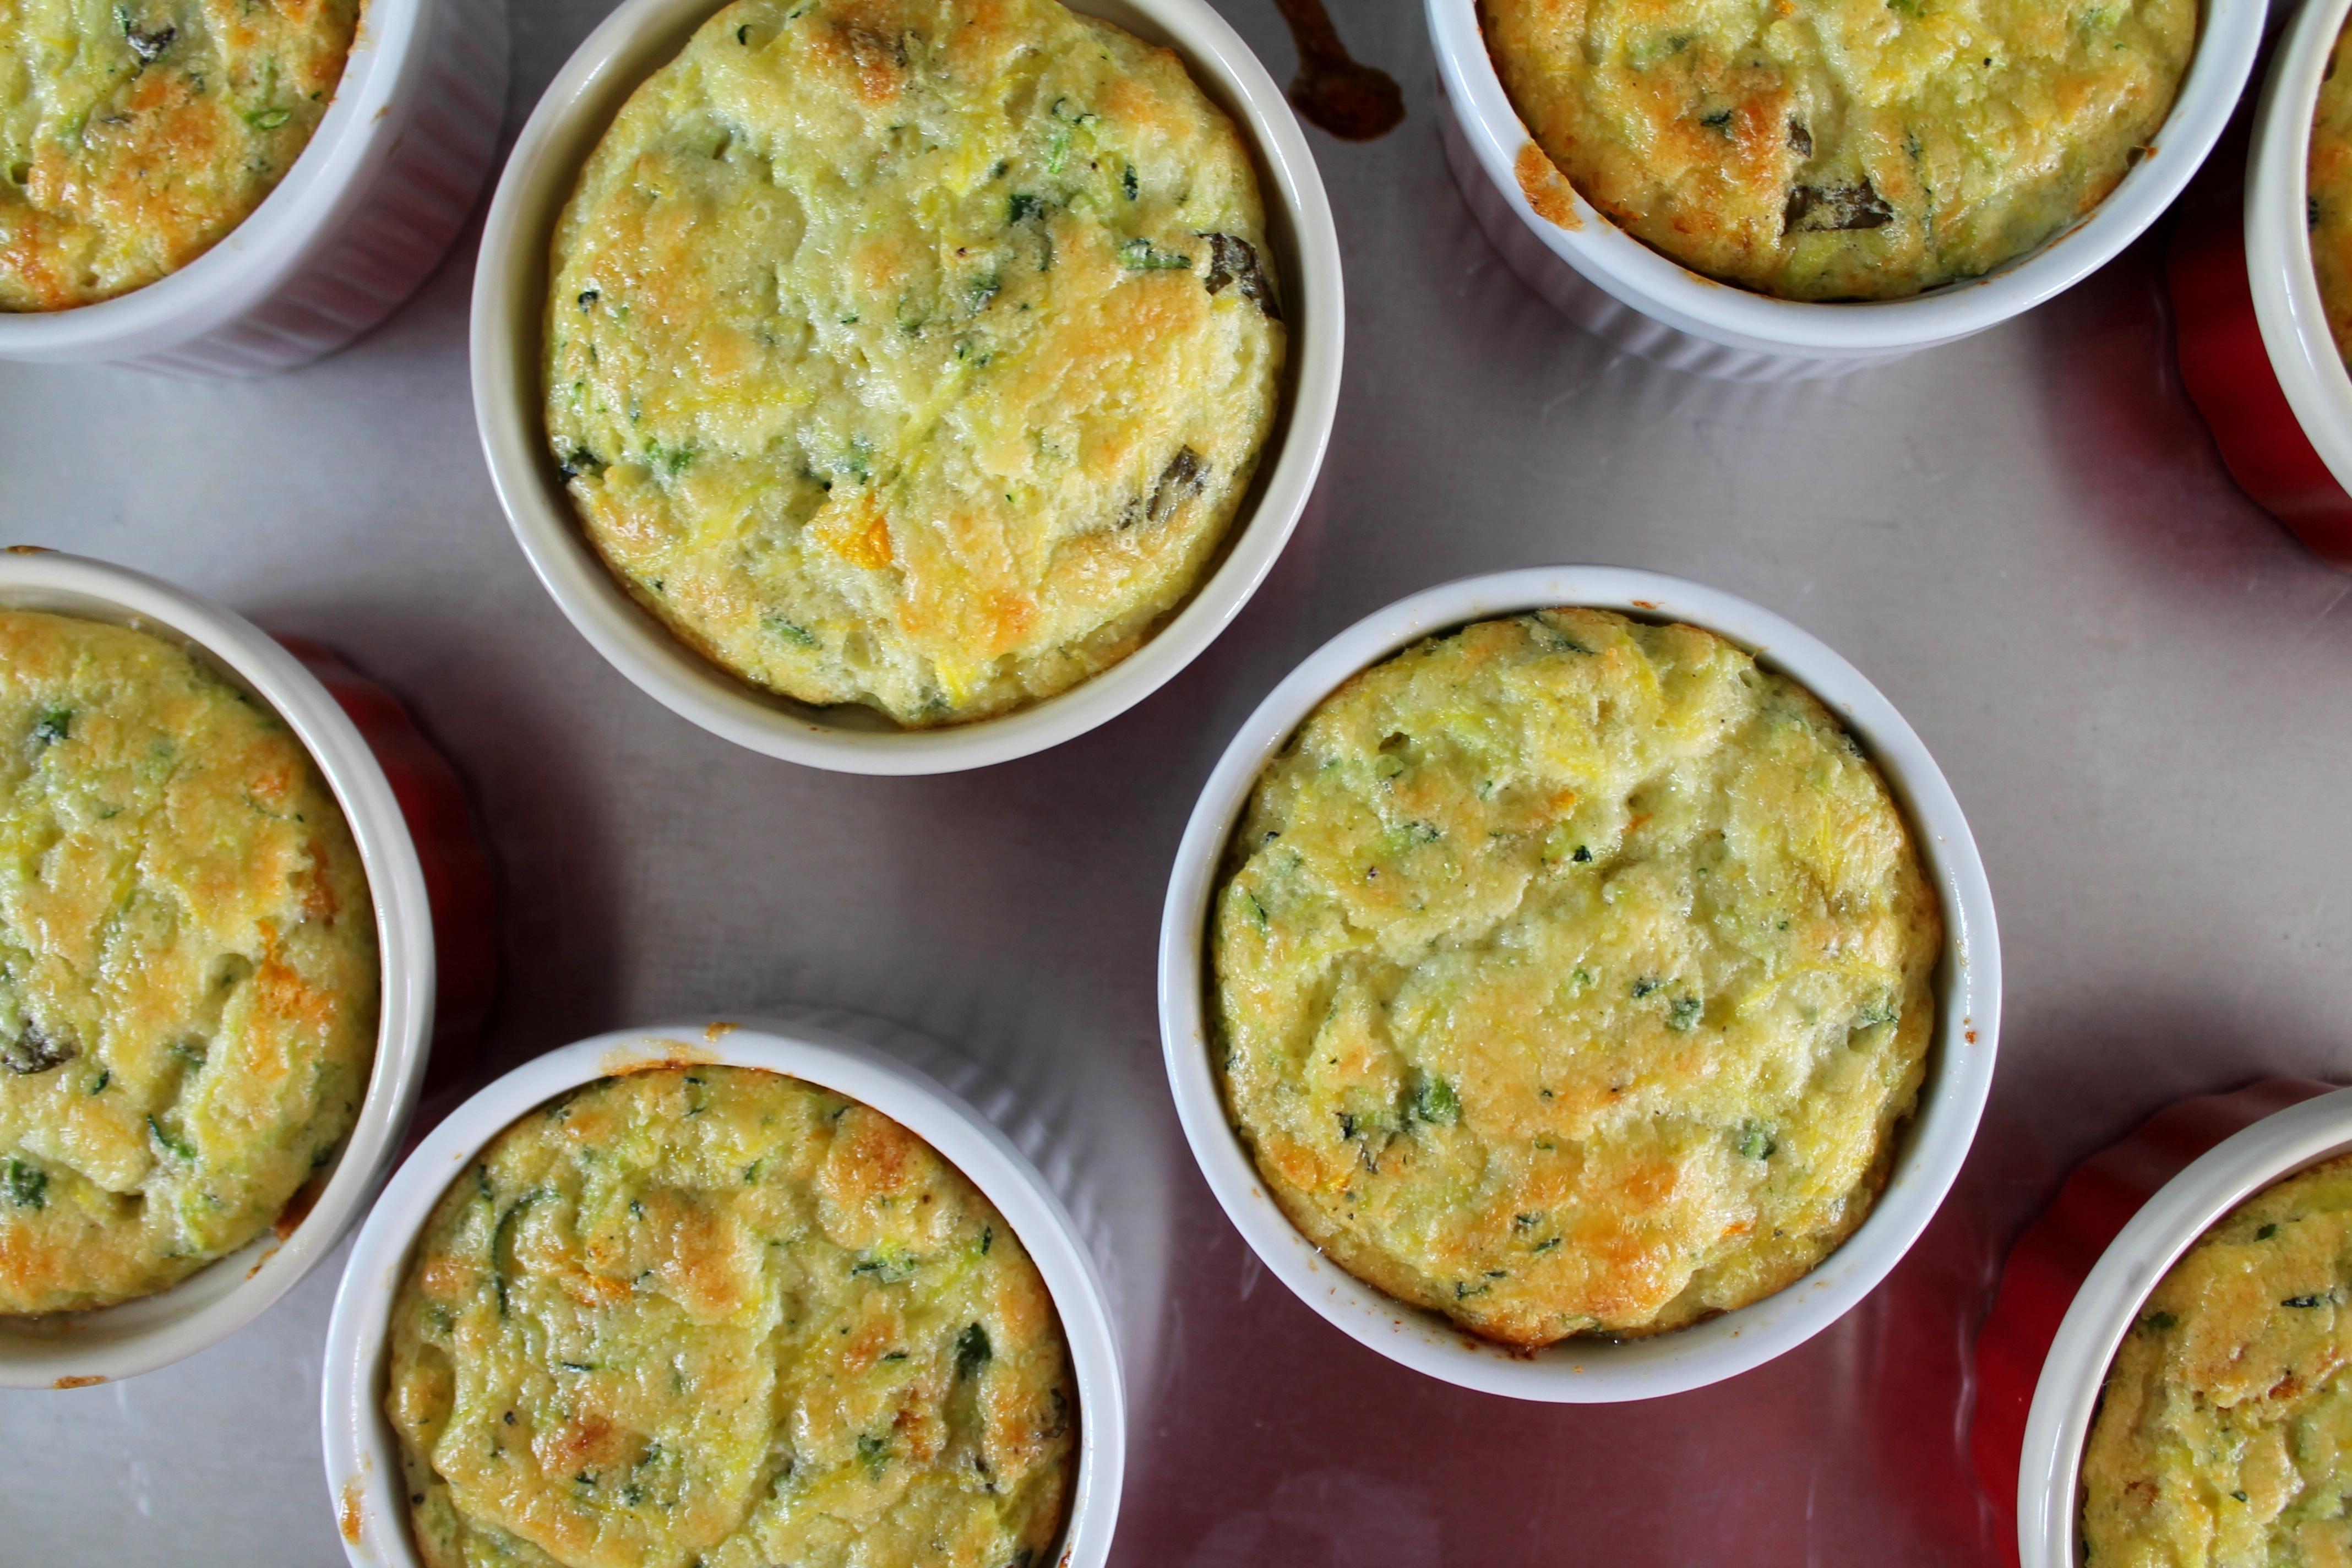 Zucchini and Squash Blossom Souffles